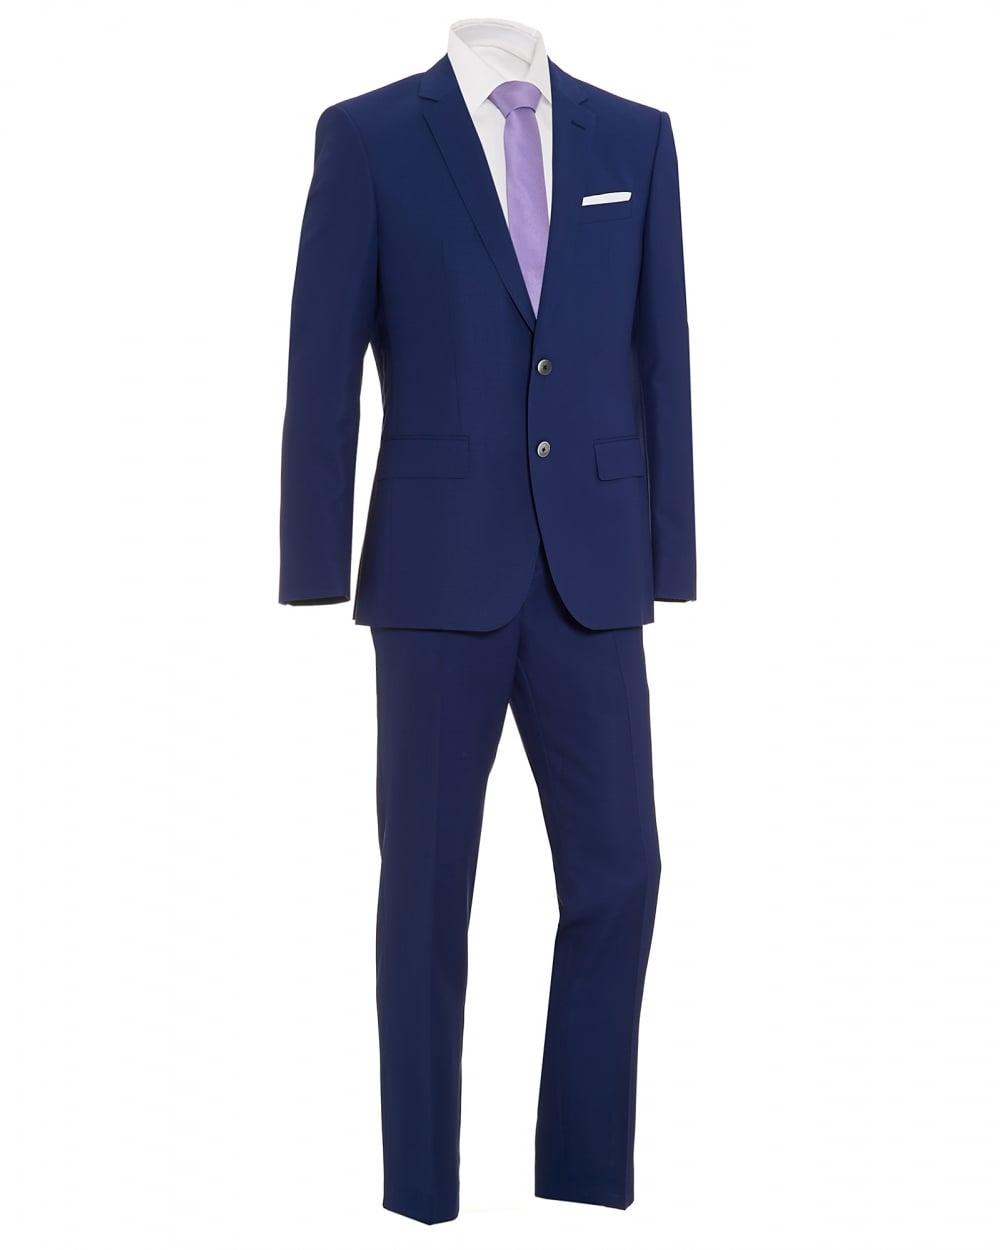 ea62fb966 Hugo Boss Classic Mens Hutson2/Gander1 Navy Blue Slim Fit Suit